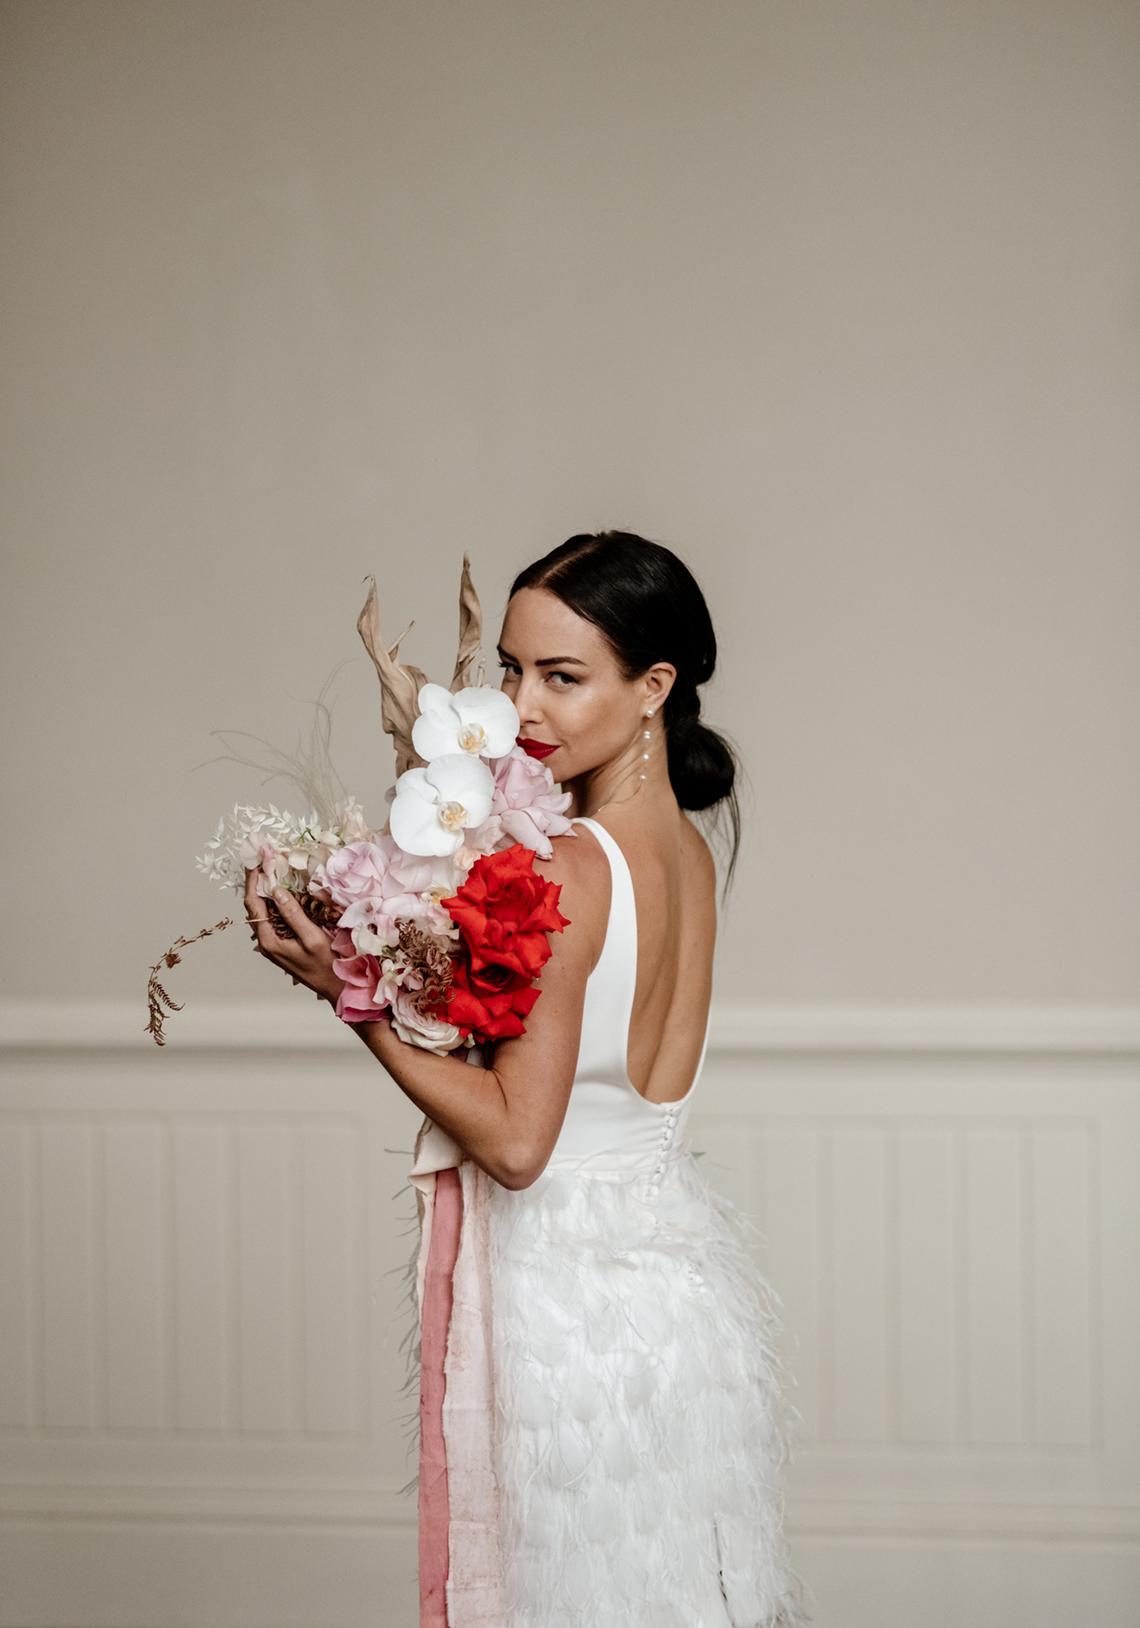 Fashion-forward Countryside Wedding Inspiration – Elmore Court – Laura Martha Photography 74